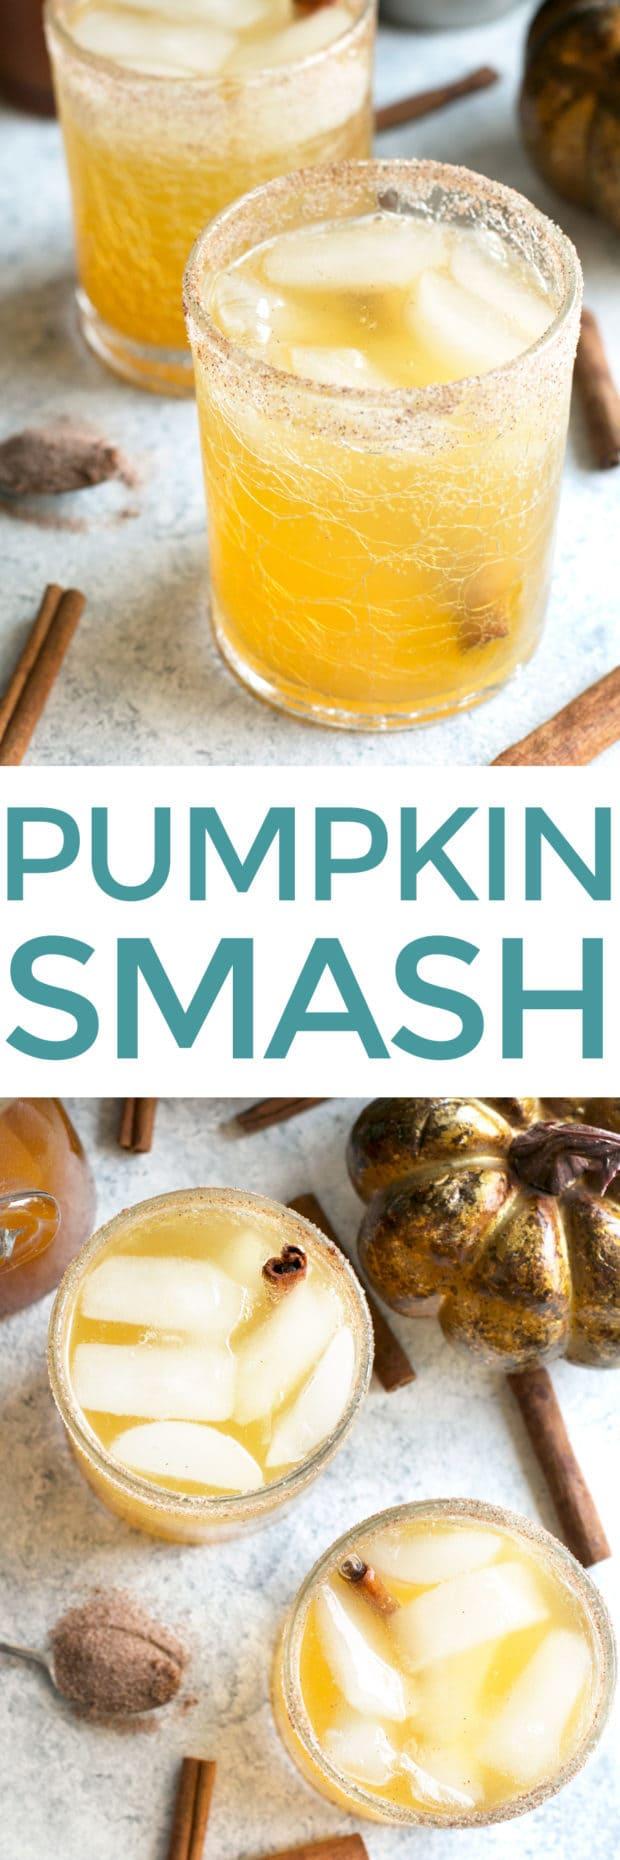 Bourbon Pumpkin Smash   cakenknife.com #cocktail #pumpkinspice #cinnamon #syrup